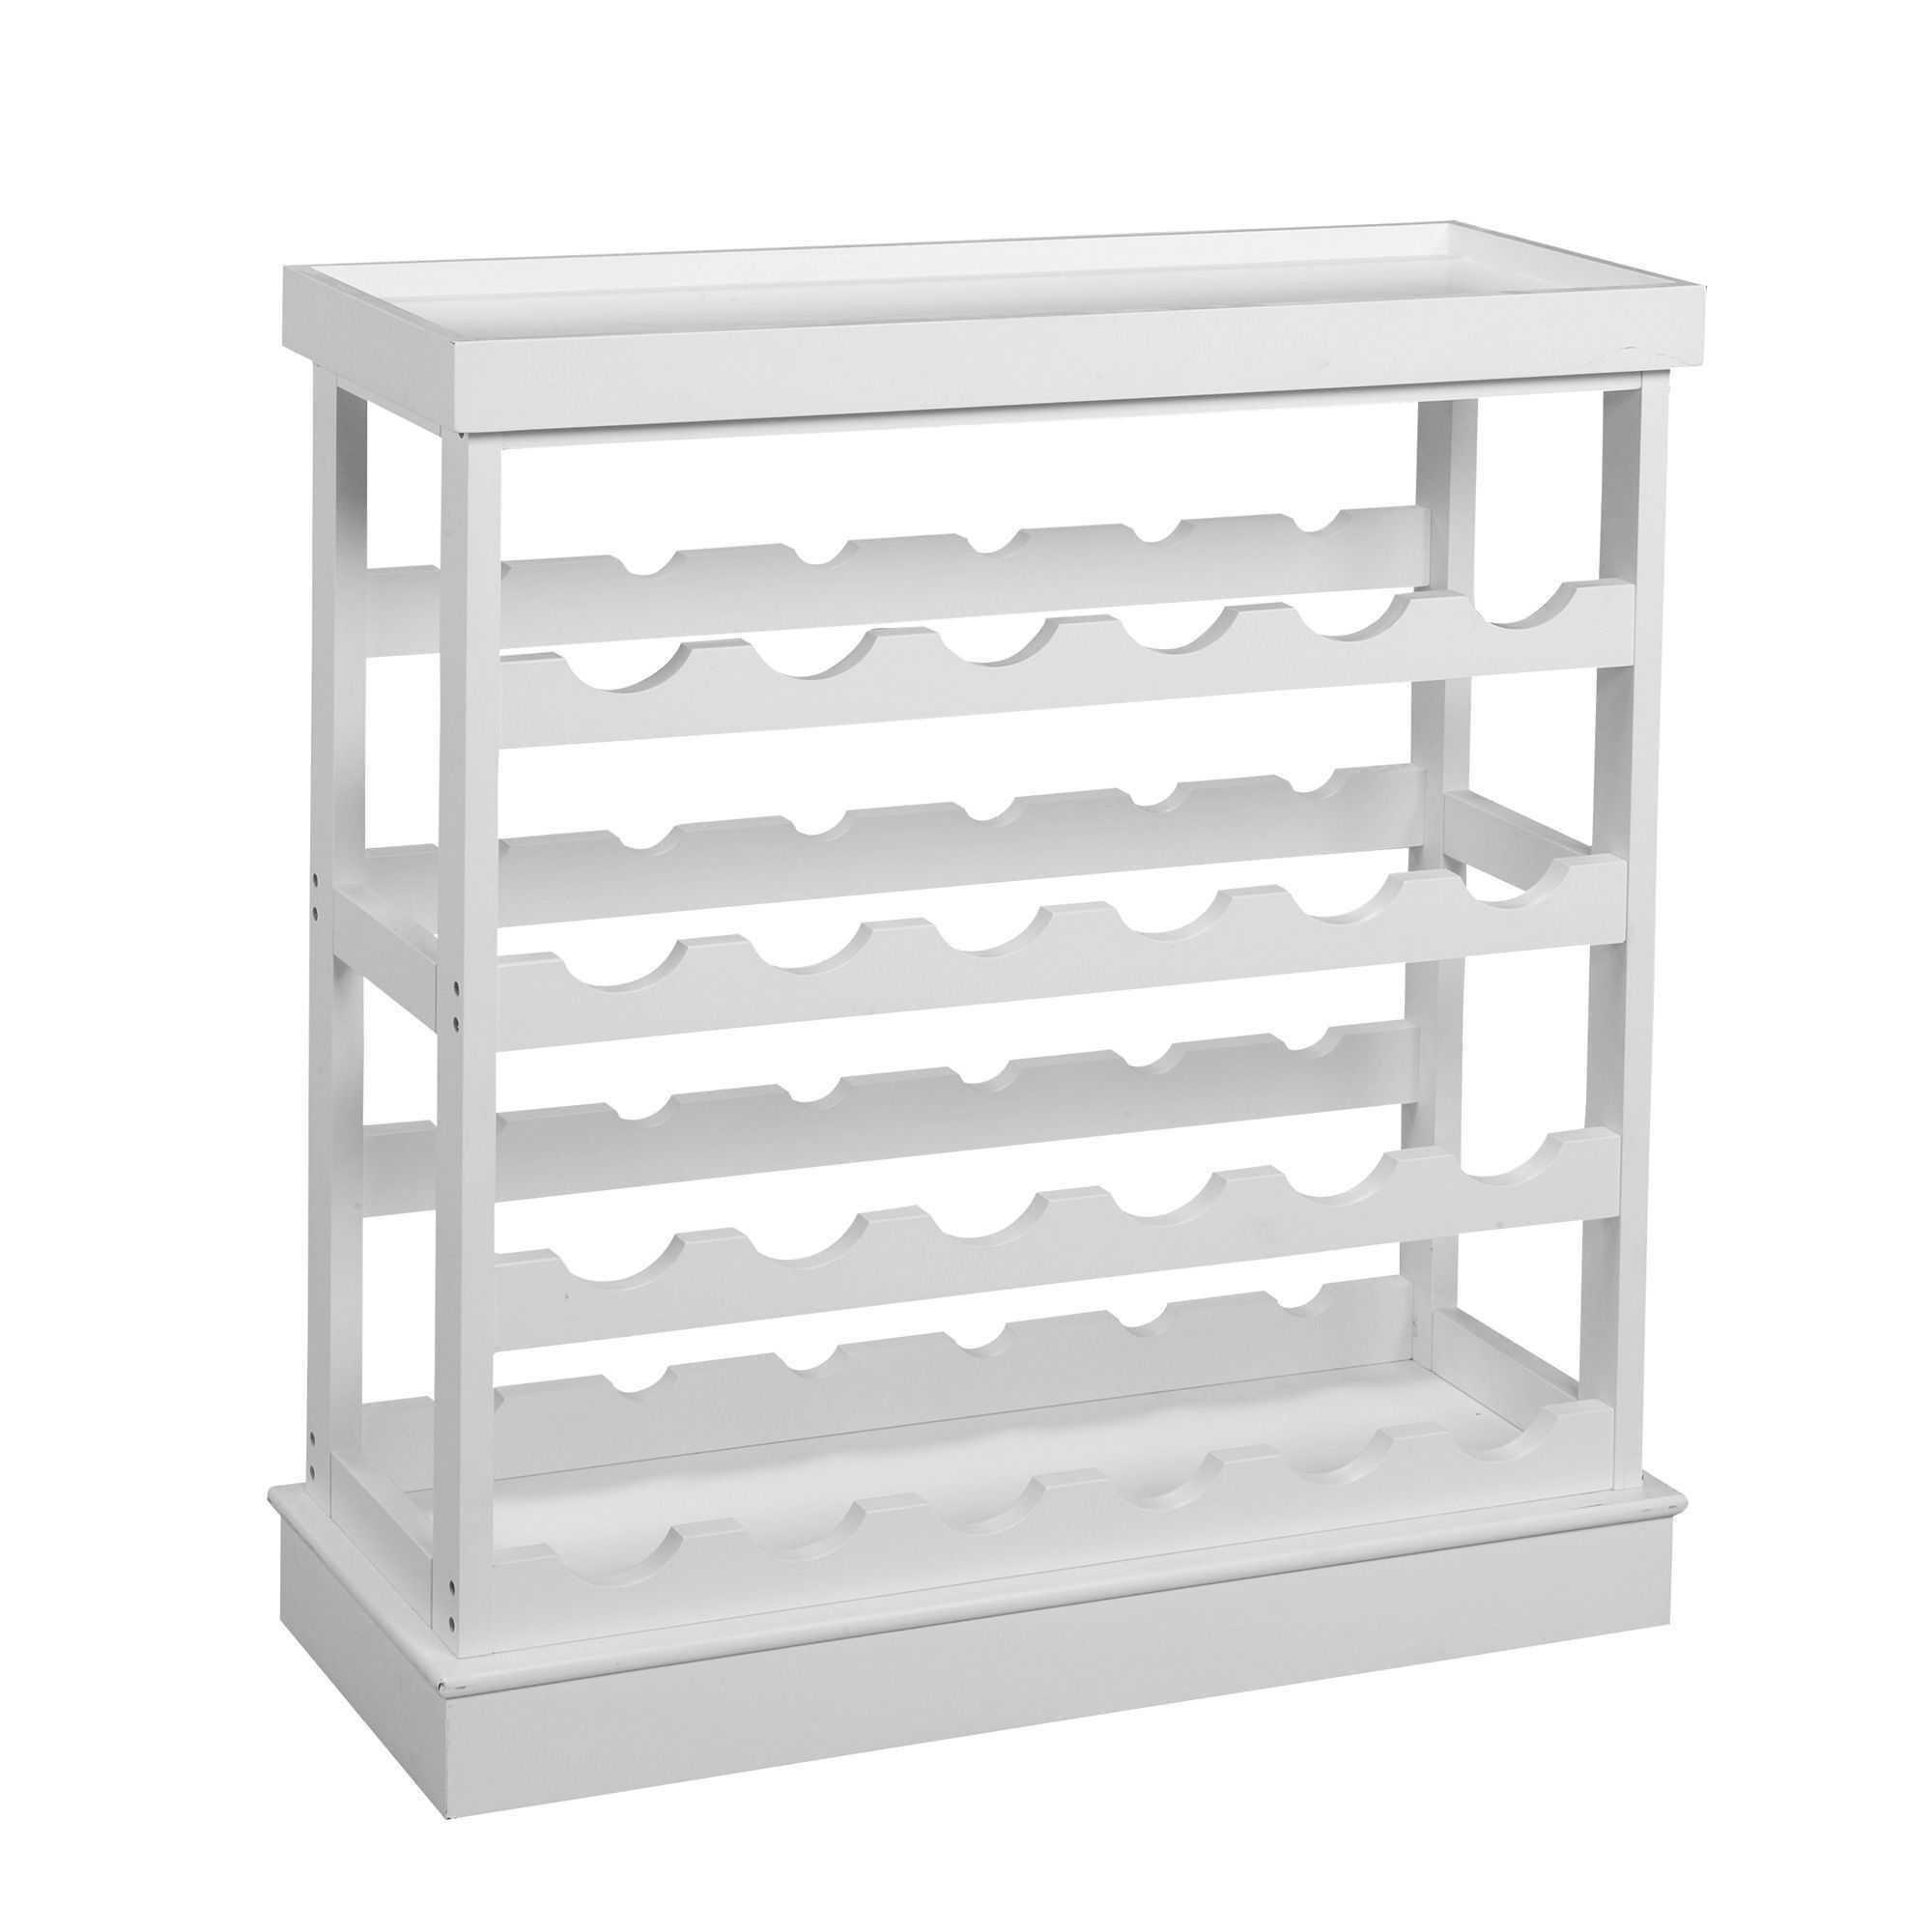 Casier Terre Cuite Vin Leroy Merlin Inspirant Stock Casier Bouteilles En Bois Ikea Amazing Range Bouteilles Ikea with